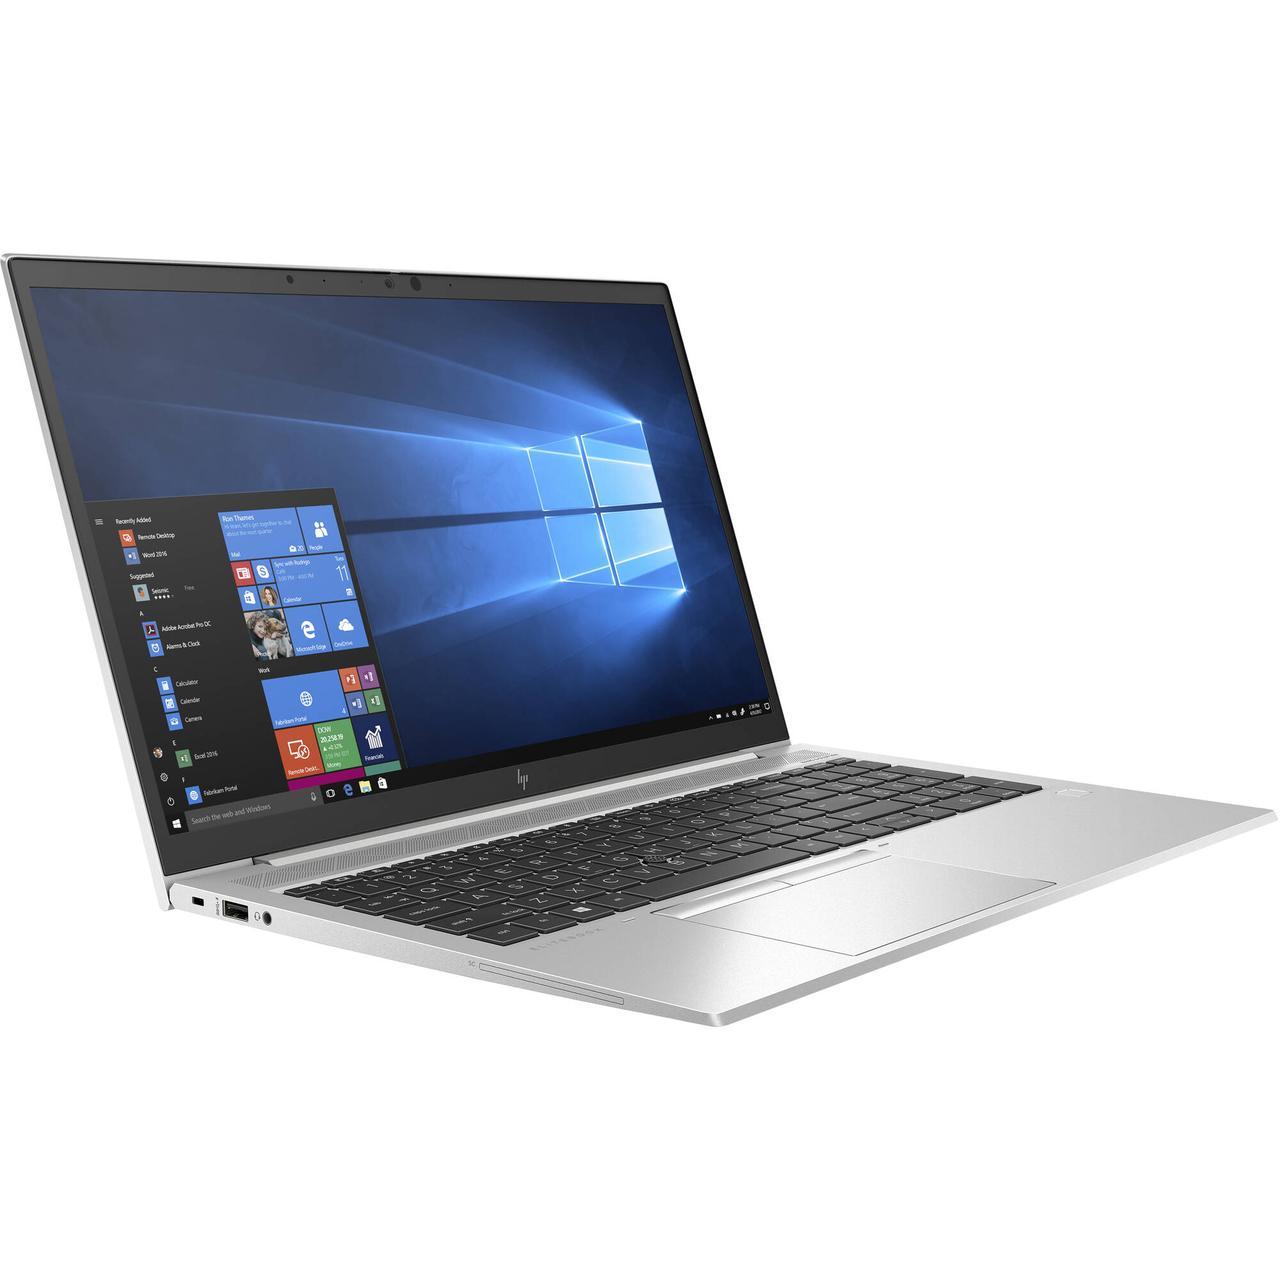 HP EliteBook 855 G7 Notebook (1W9S2UT#ABA)